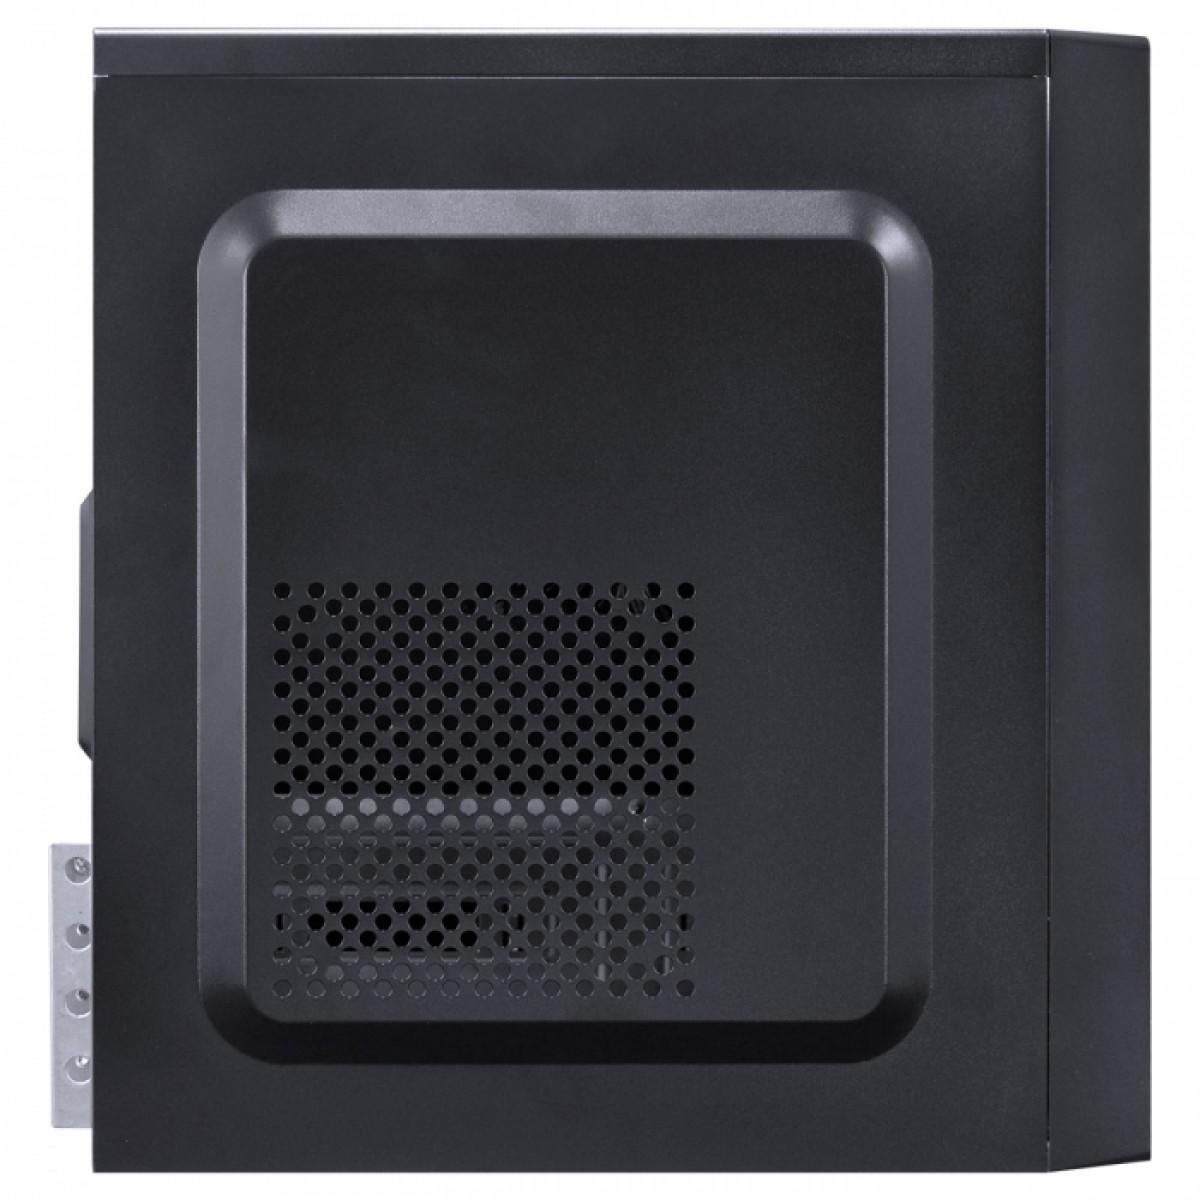 Computador Skul T-Home H200 PENTIUM DUAL CORE G6400 / 4GB DDR4 / HD 500GB / HDMI/VGA / FONTE 200W